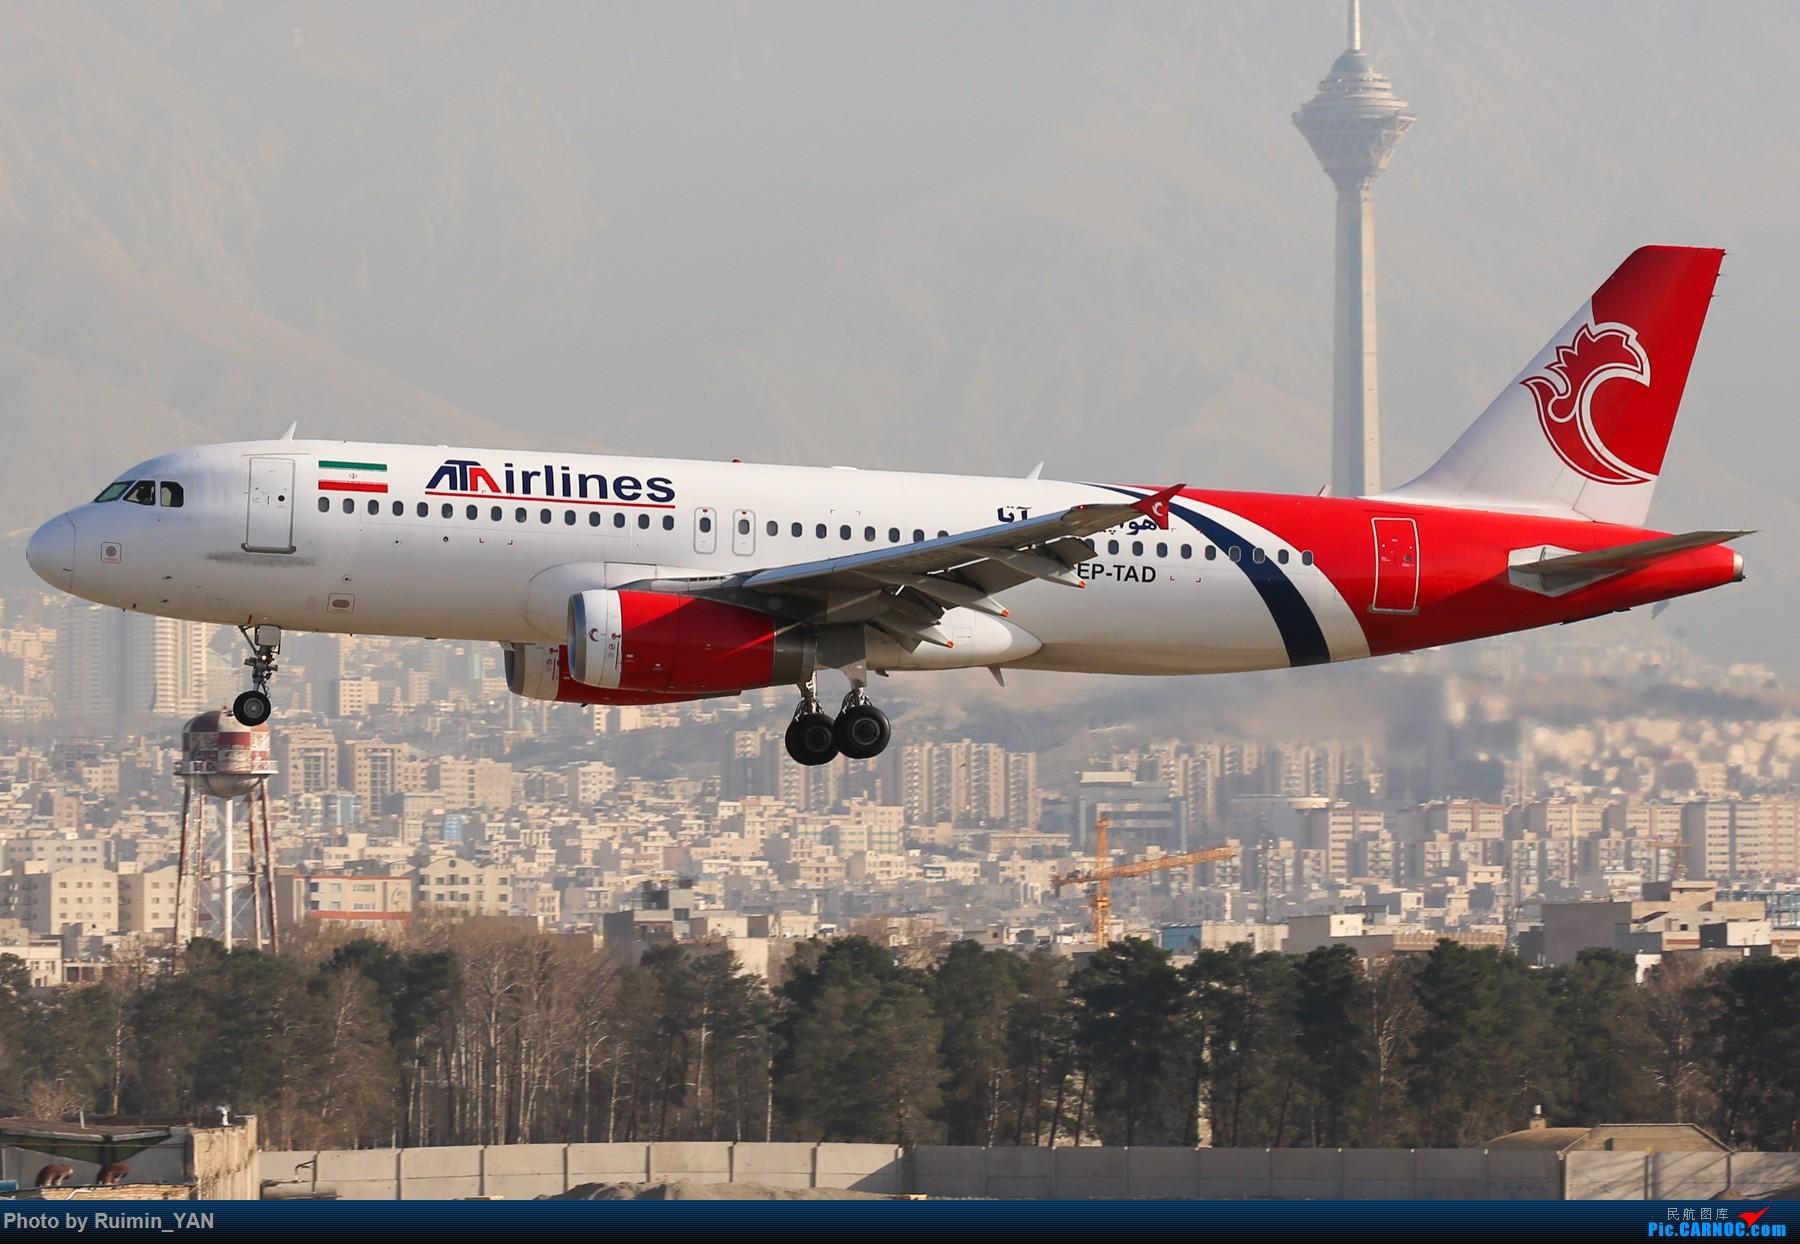 [原创]【THR】(德黑兰梅赫拉巴德机场)伊朗ATA航空(ATA Airlines,I3)--A320,MD83 AIRBUS A320-200 EP-TAD 德黑兰梅赫拉巴德国际机场